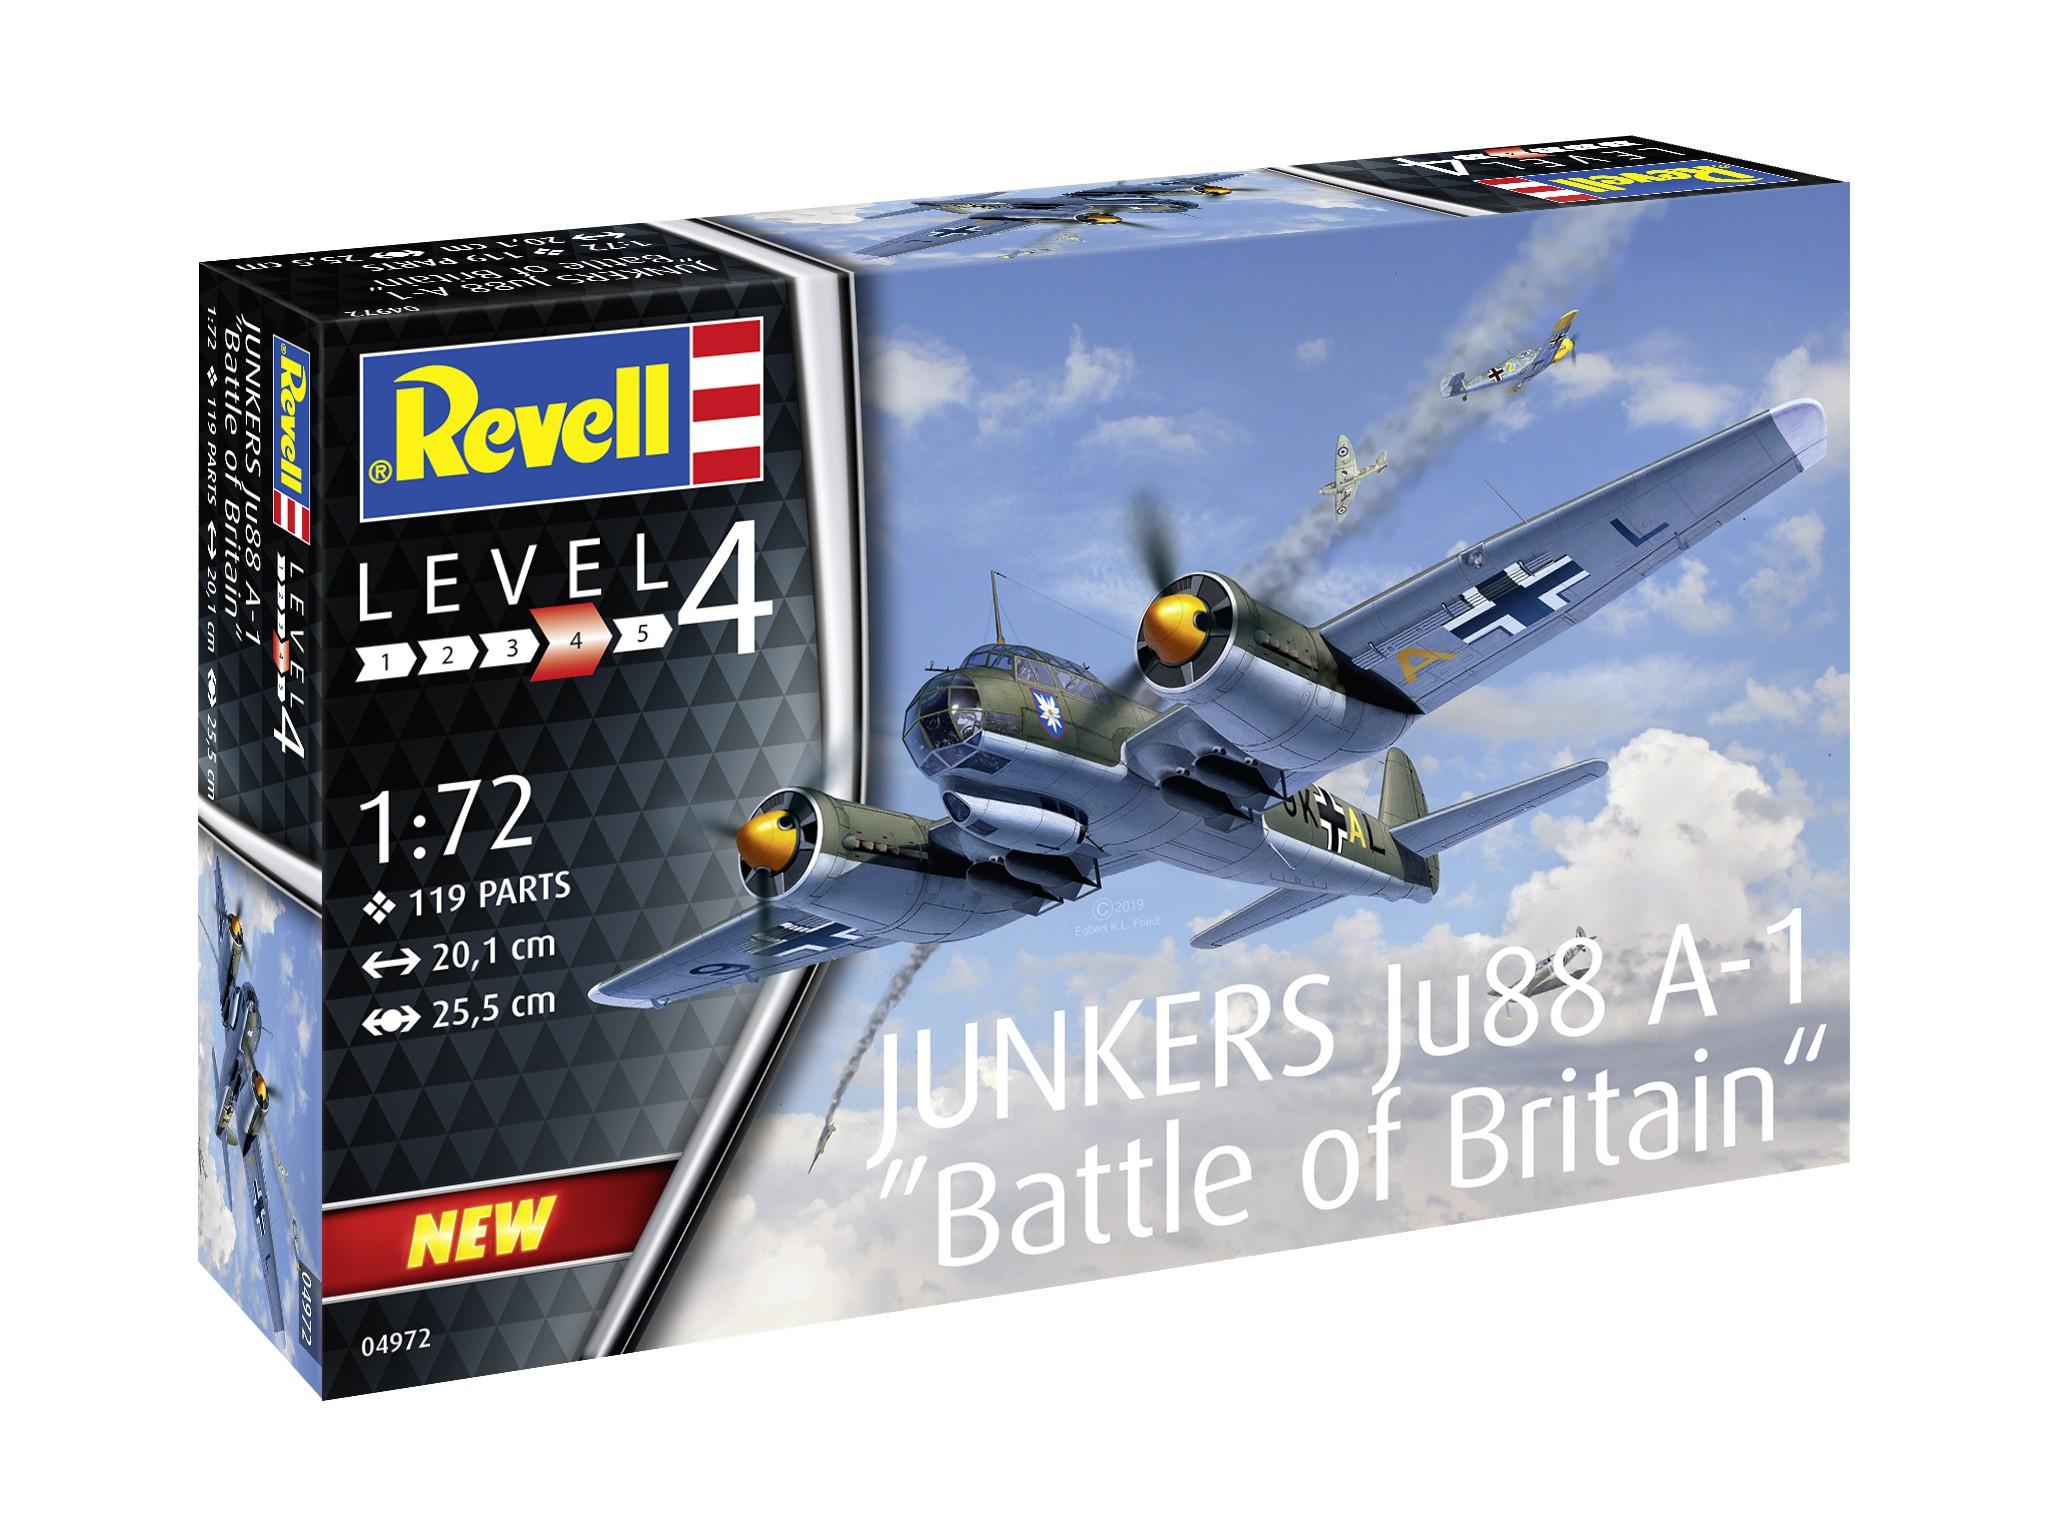 Junkers Ju88 A-1 Battle of Britain